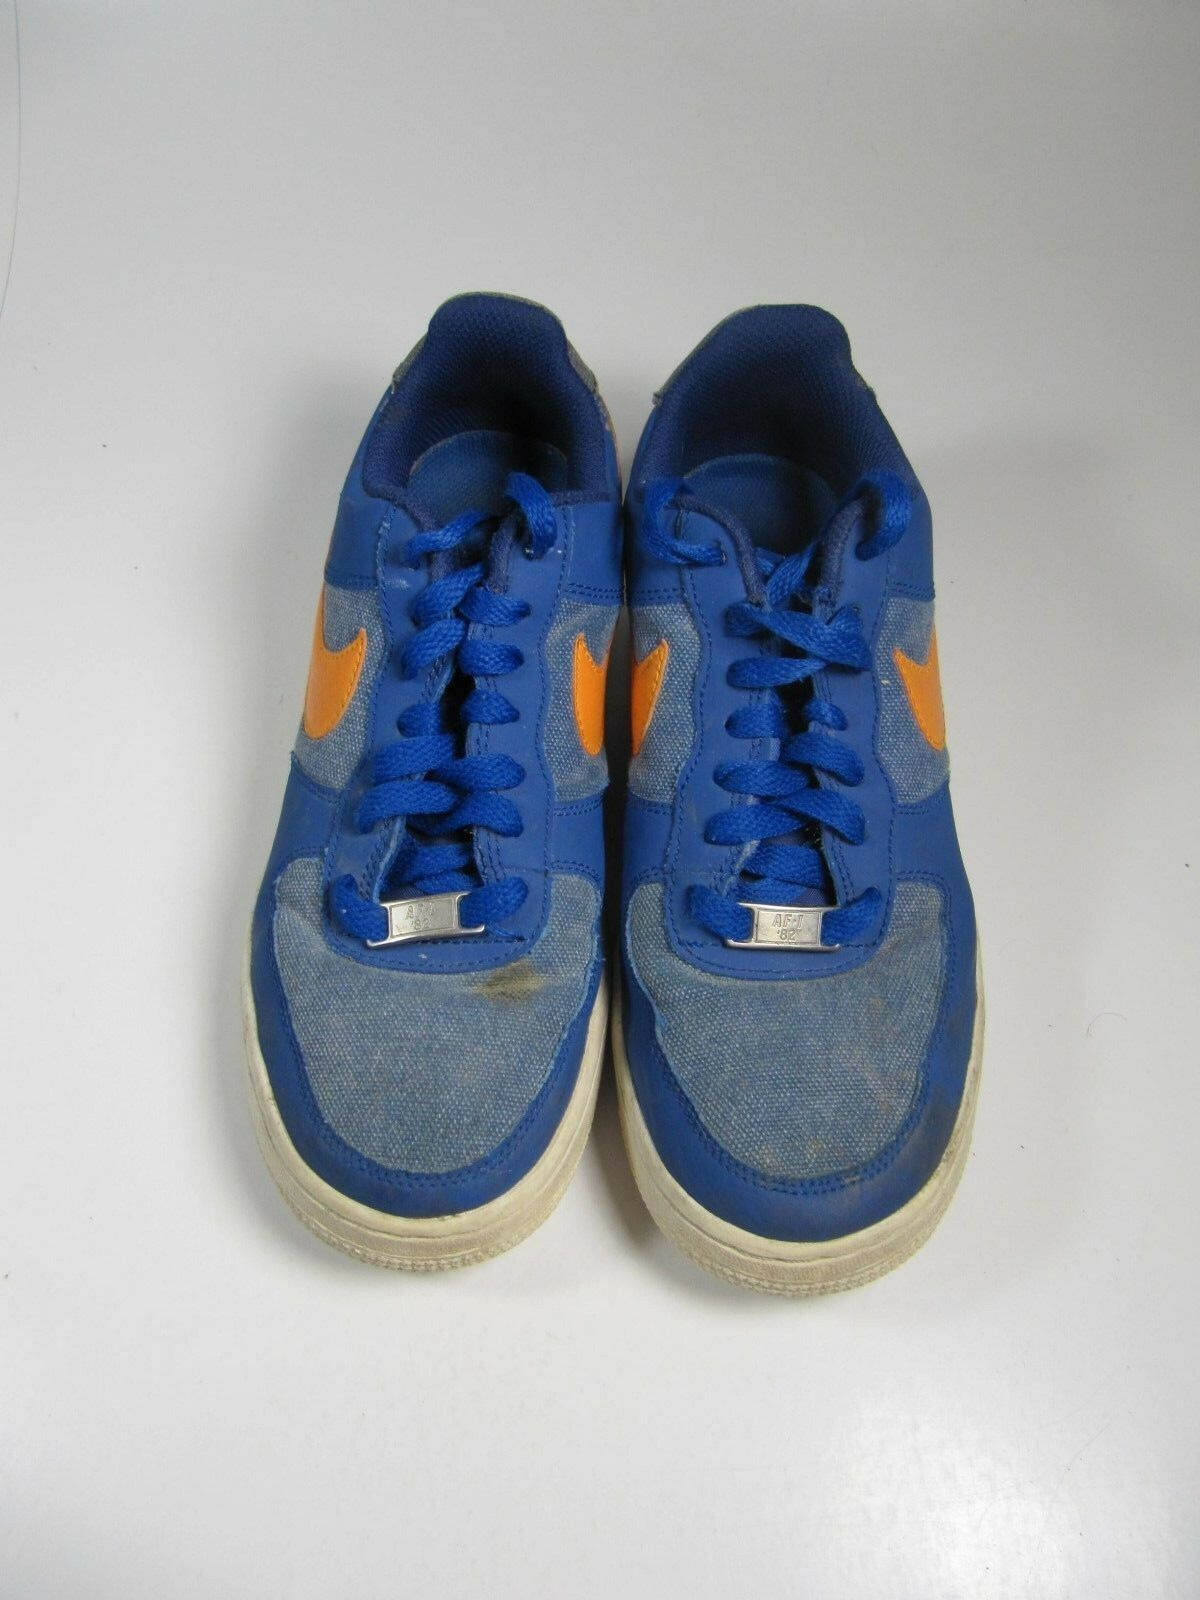 nike nike nike air force garçons chaussures 5.5y bleu orange baskets | Grand Assortiment  1c6052